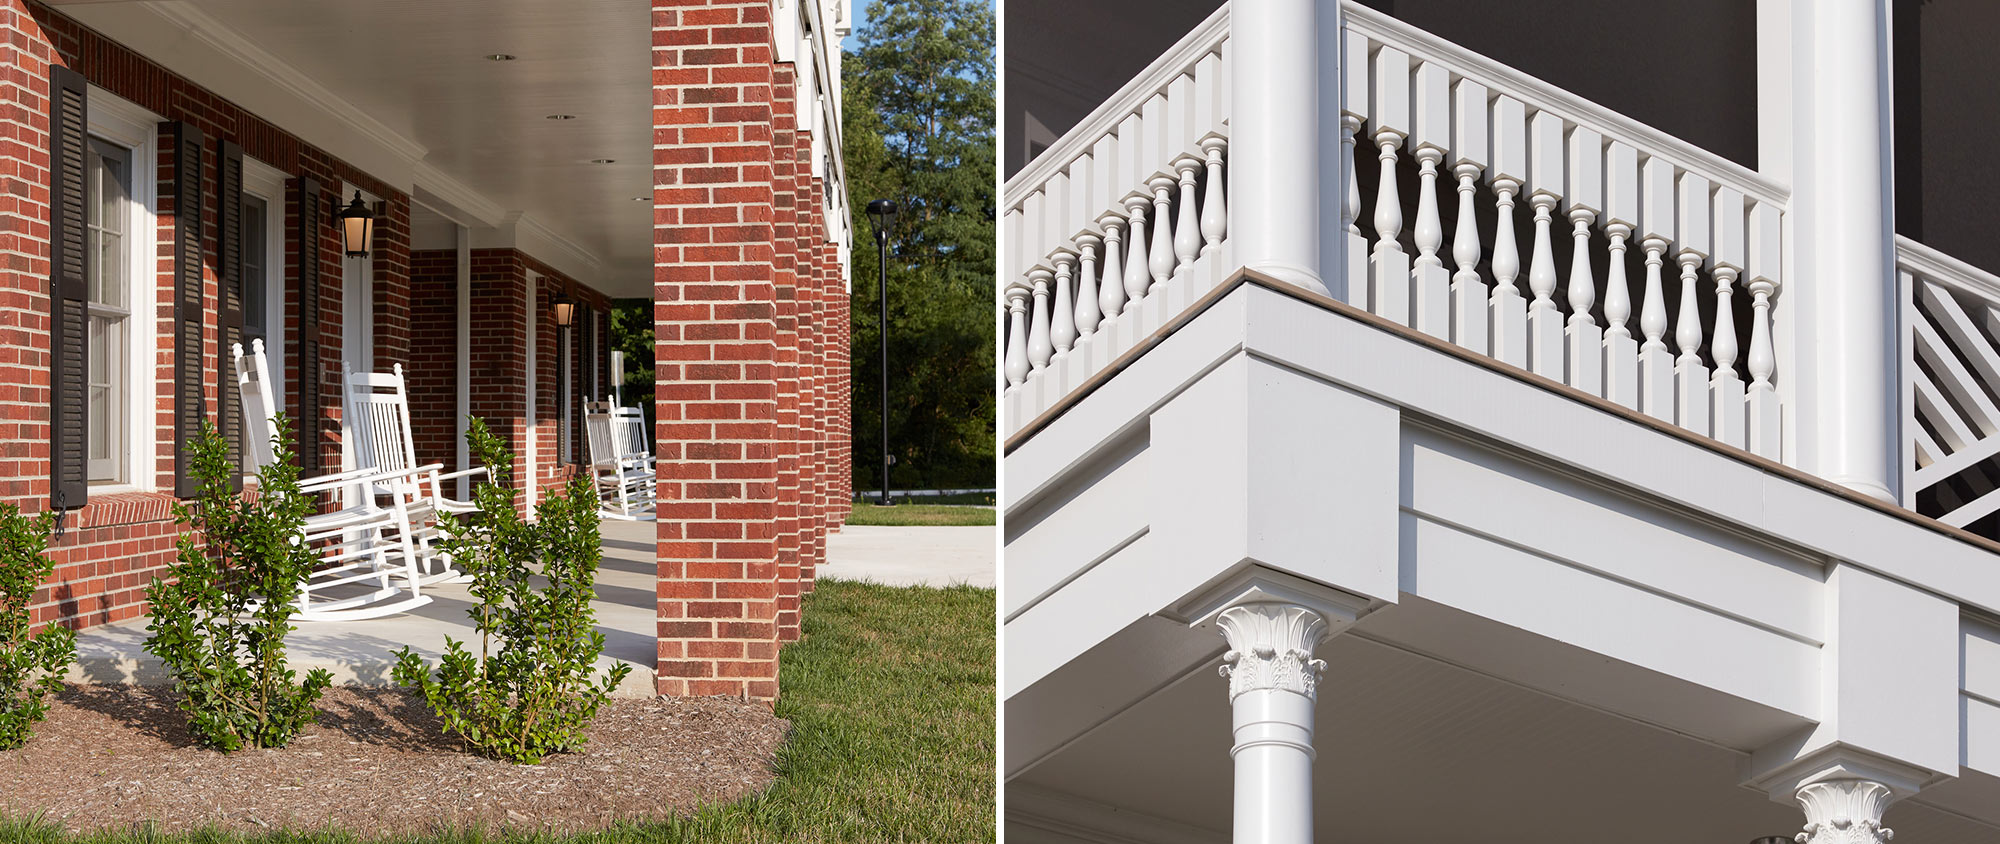 Shenandoah University Aspirational Village – Caruthers House + Roni's Roost